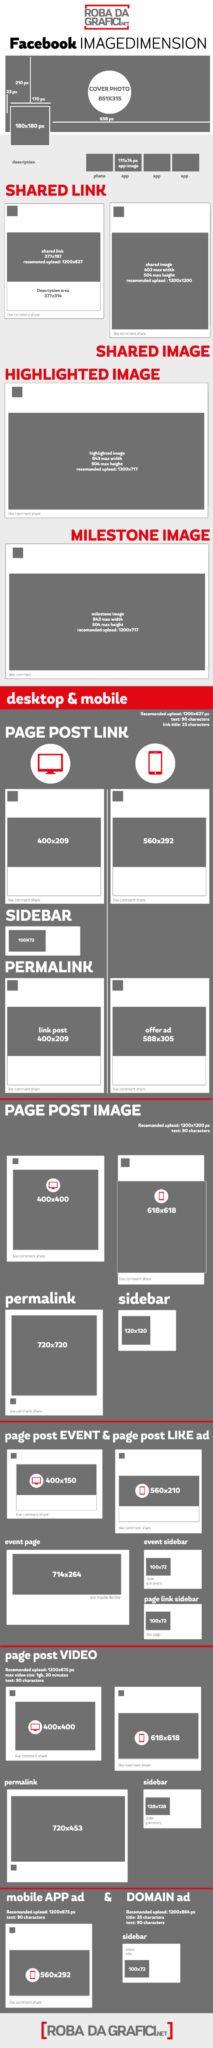 infografica-rdg-facebook